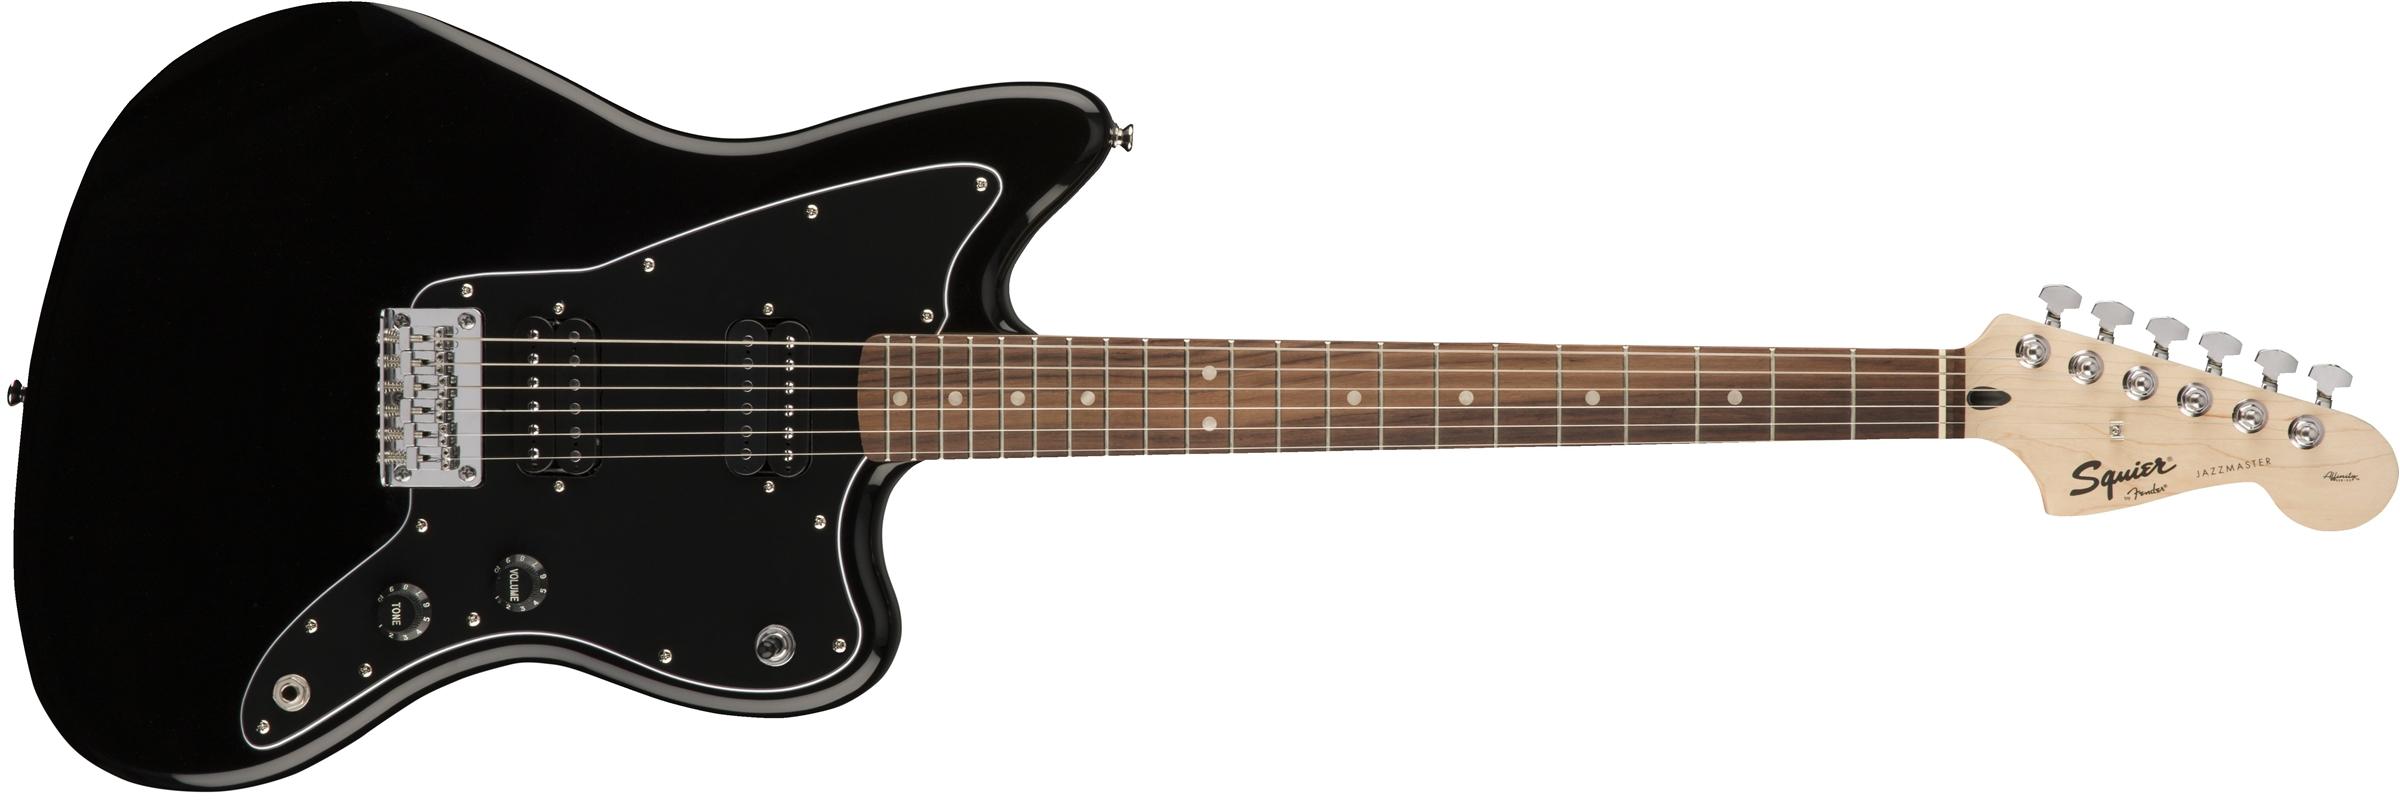 Squier Affinity Series Jazzmaster 174 Hh Black